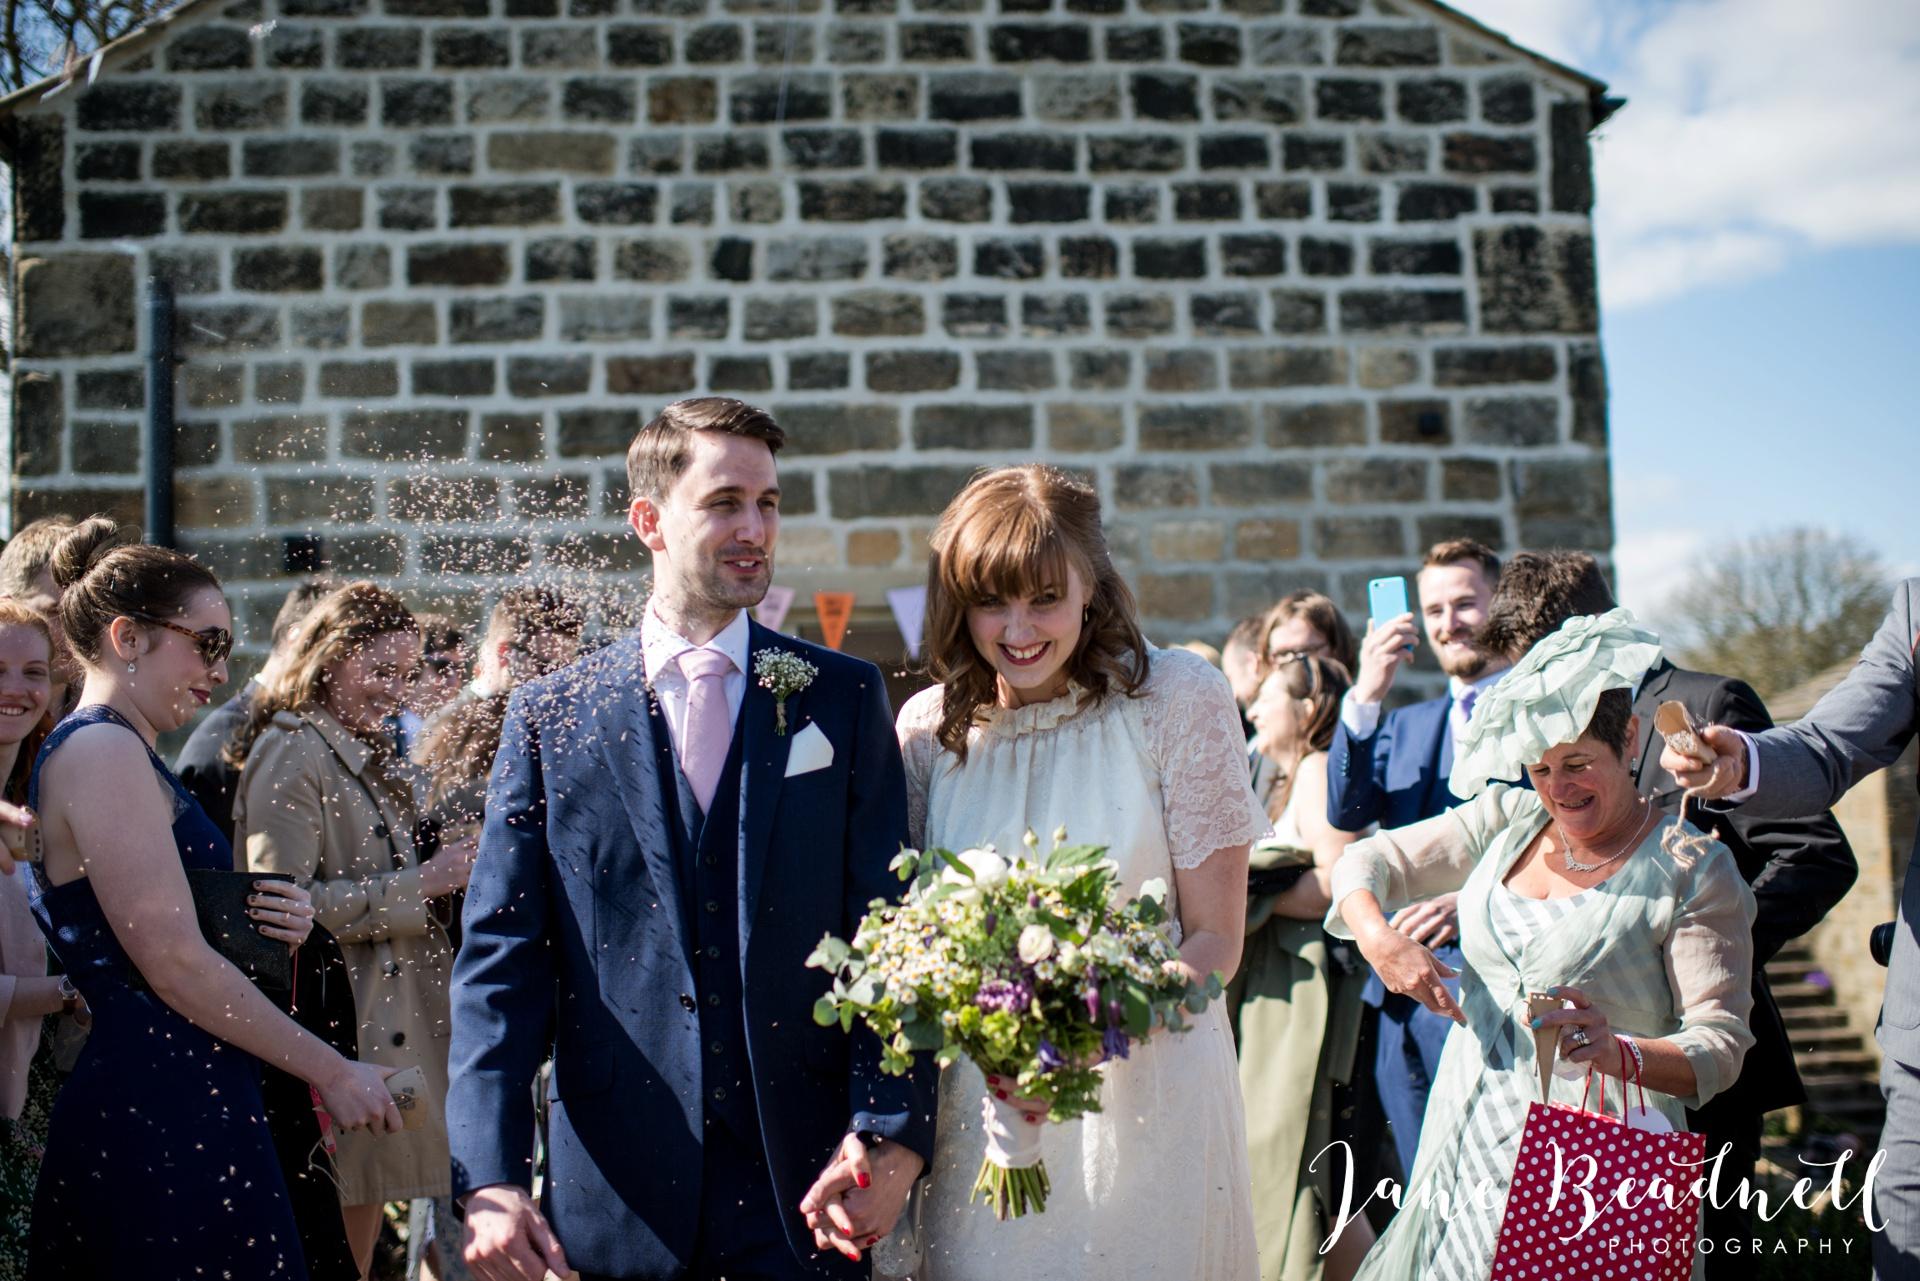 Jane Beadnell fine art wedding photographer The Cheerful Chilli Barn Otley_0026